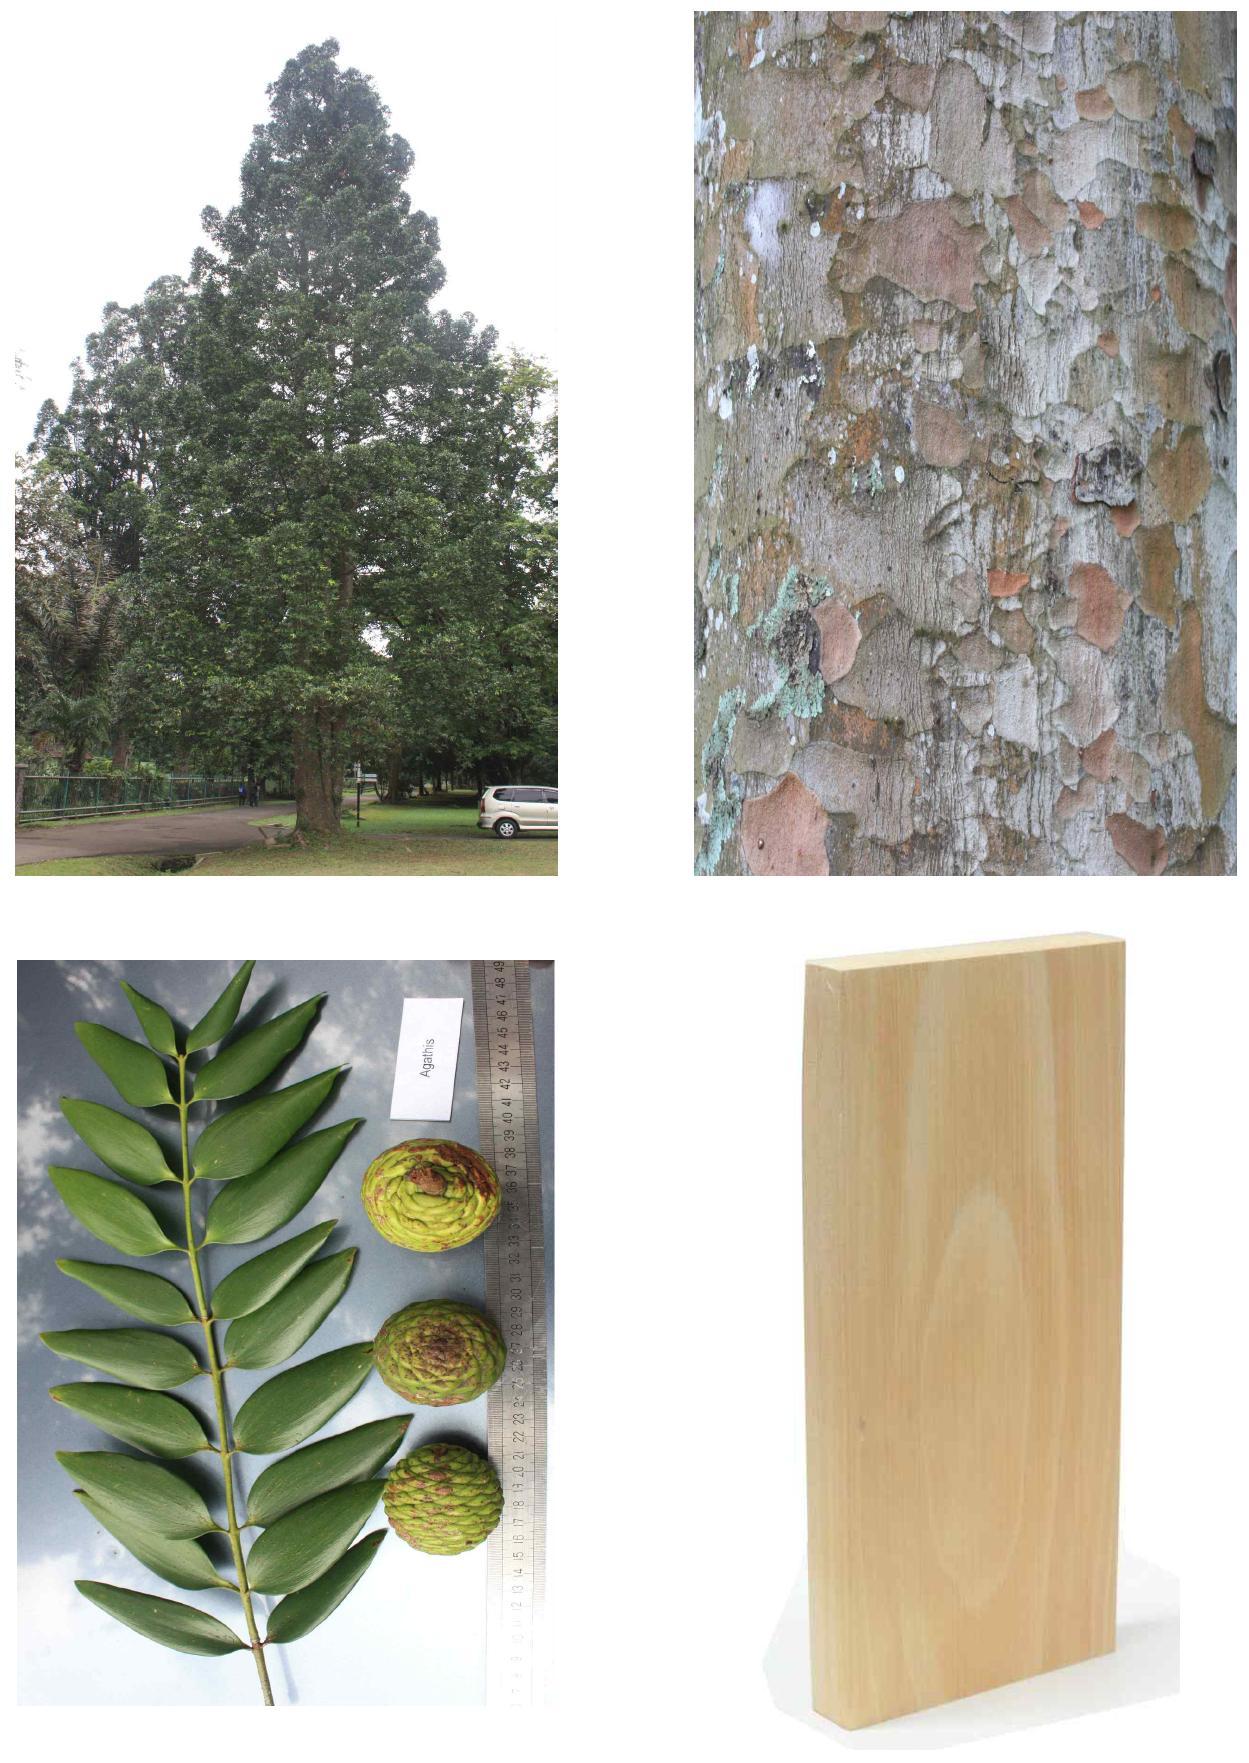 Agathis의 전체수형, 수피, 잎 및 재면.